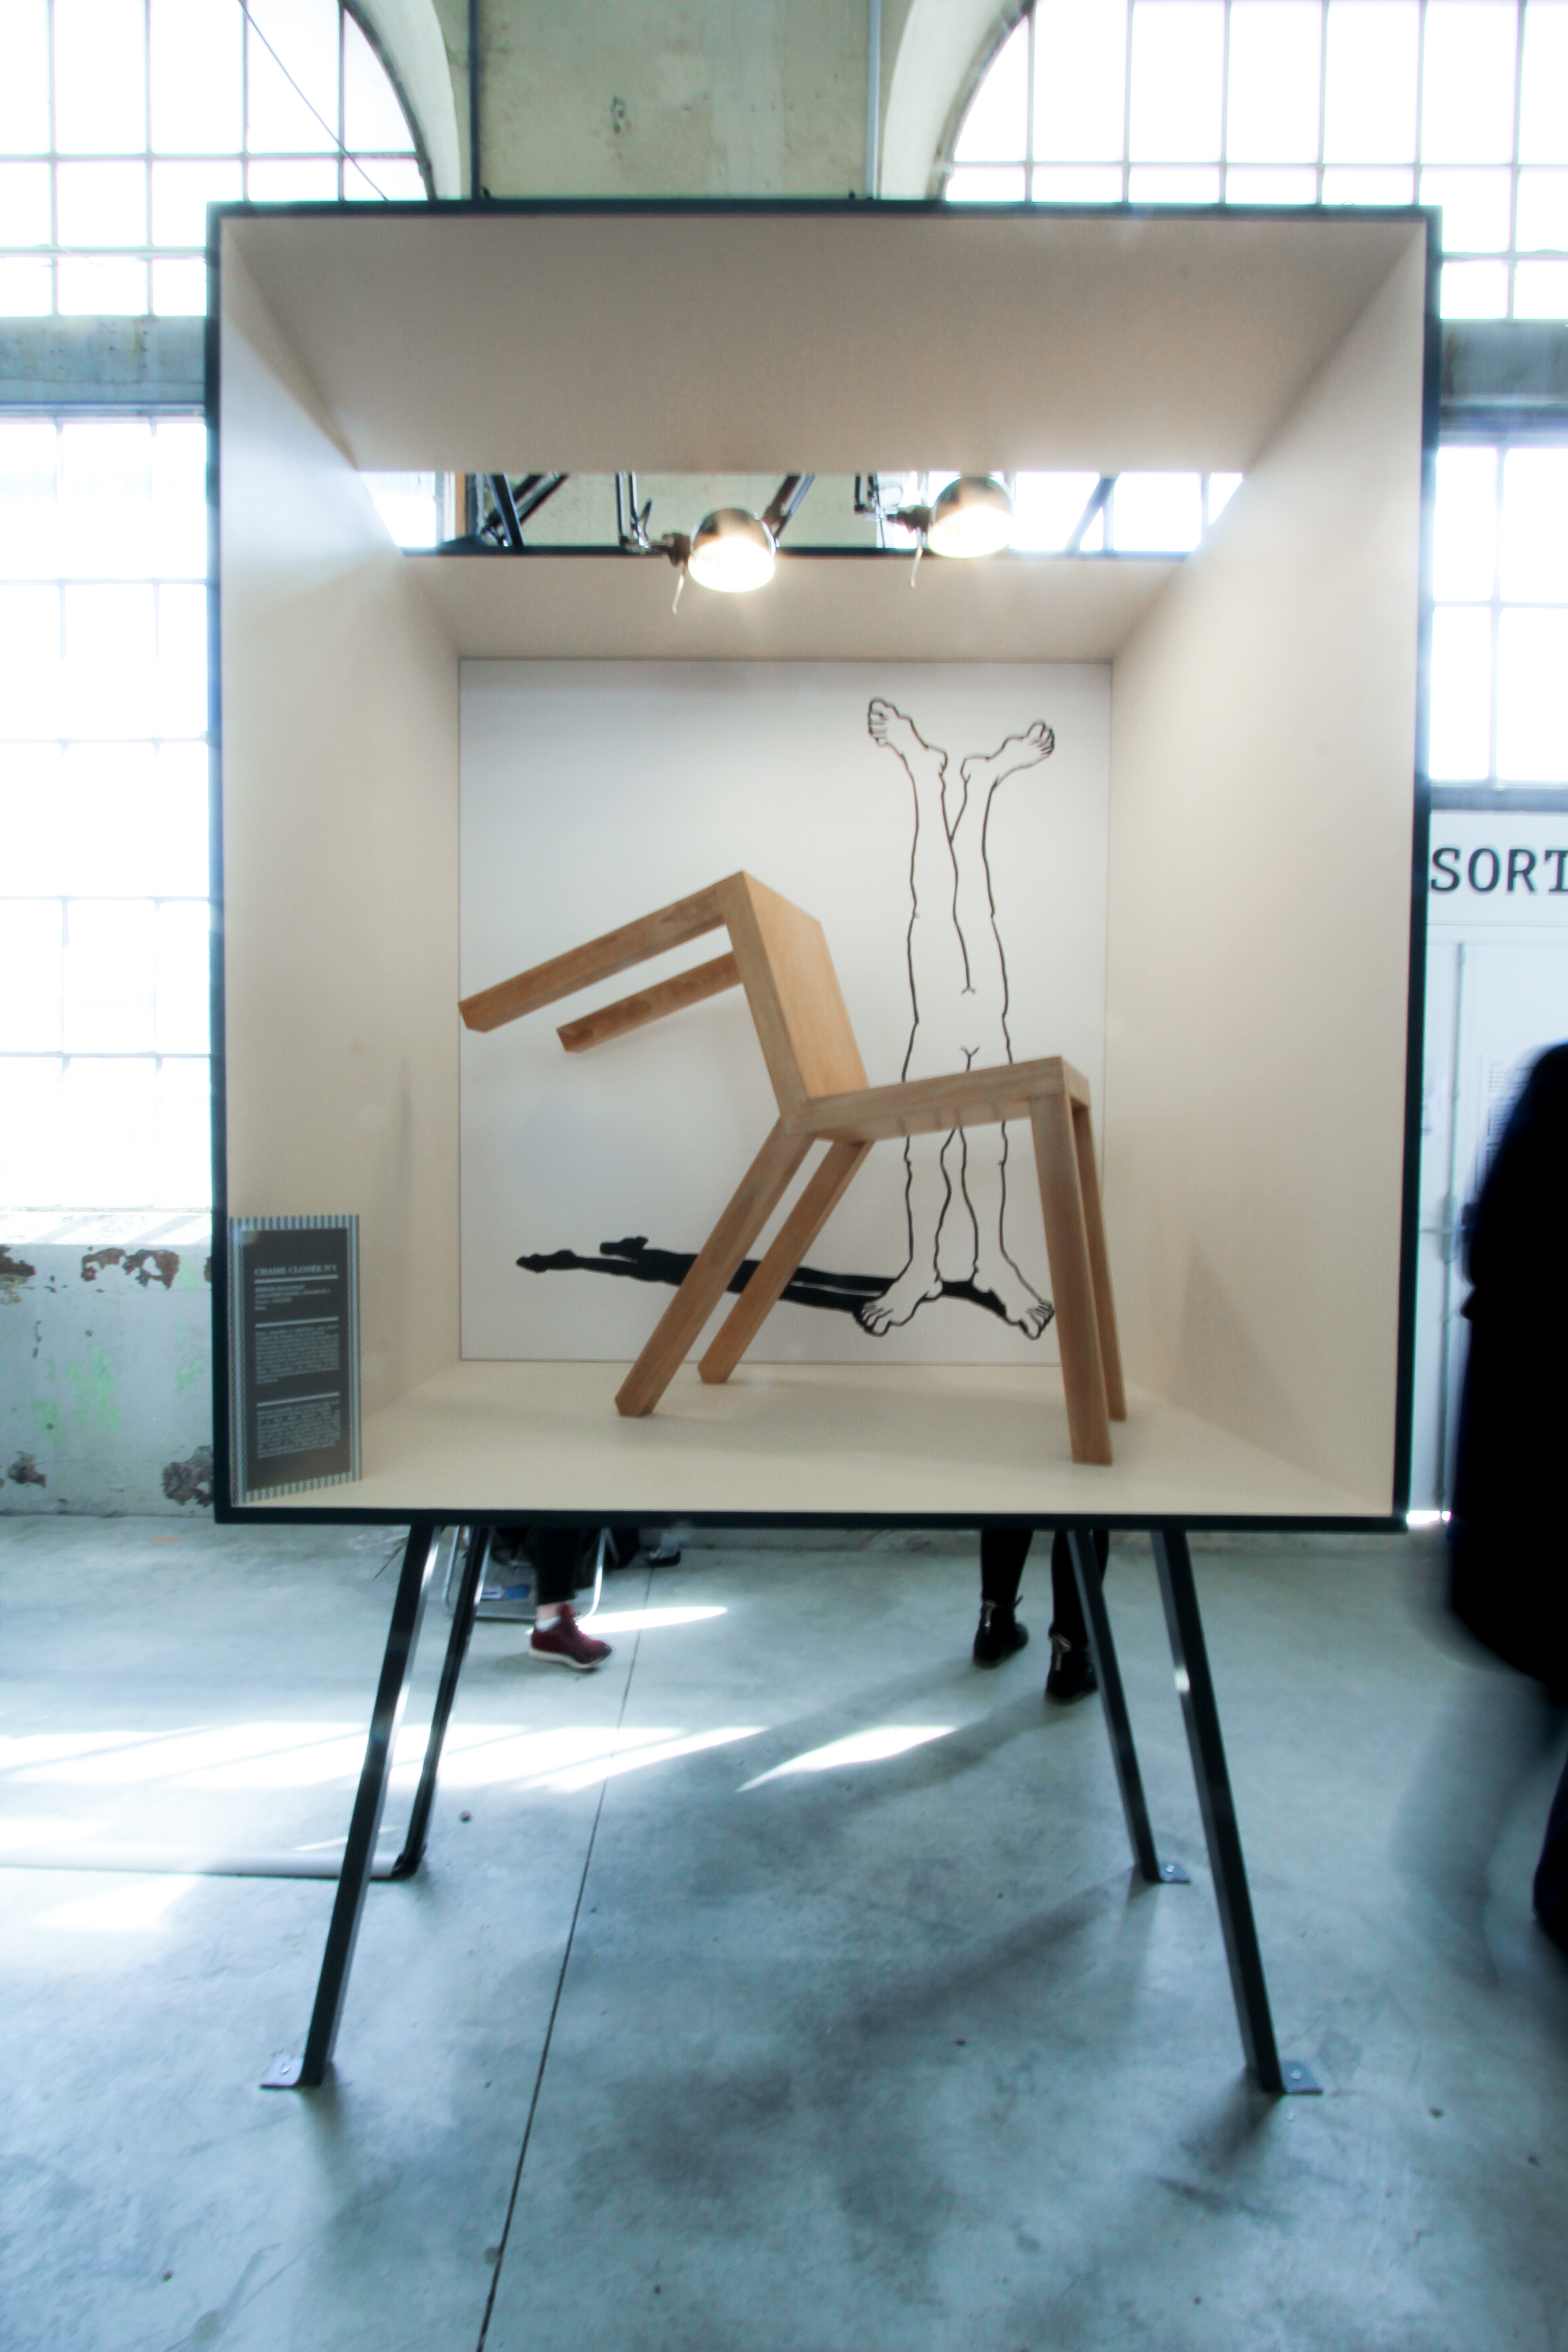 Futurecrafter_BiennaleSaintEtienne (16 of 35).jpg